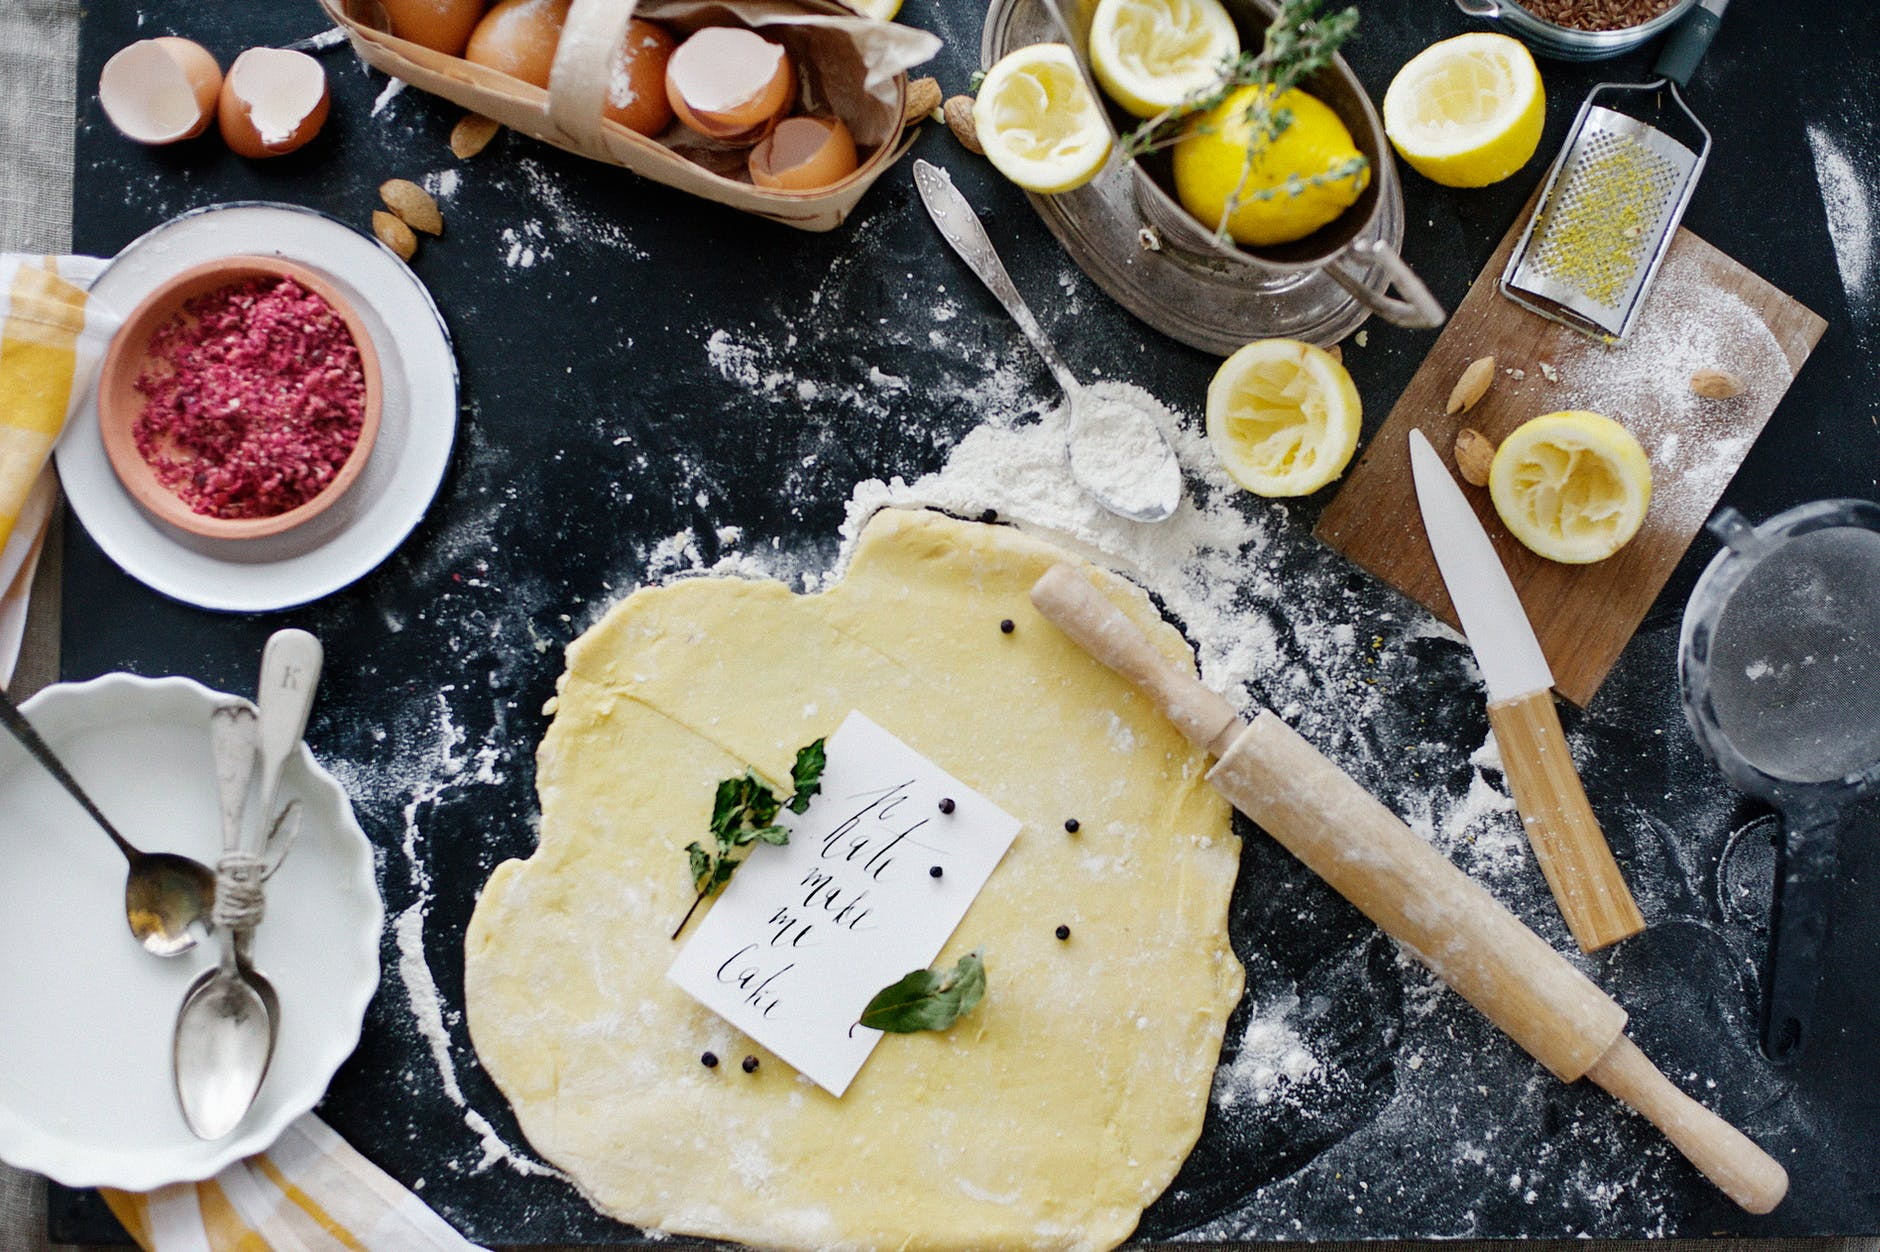 pasta-frolla-impasto-limoni-uova-mattarello-coltello-